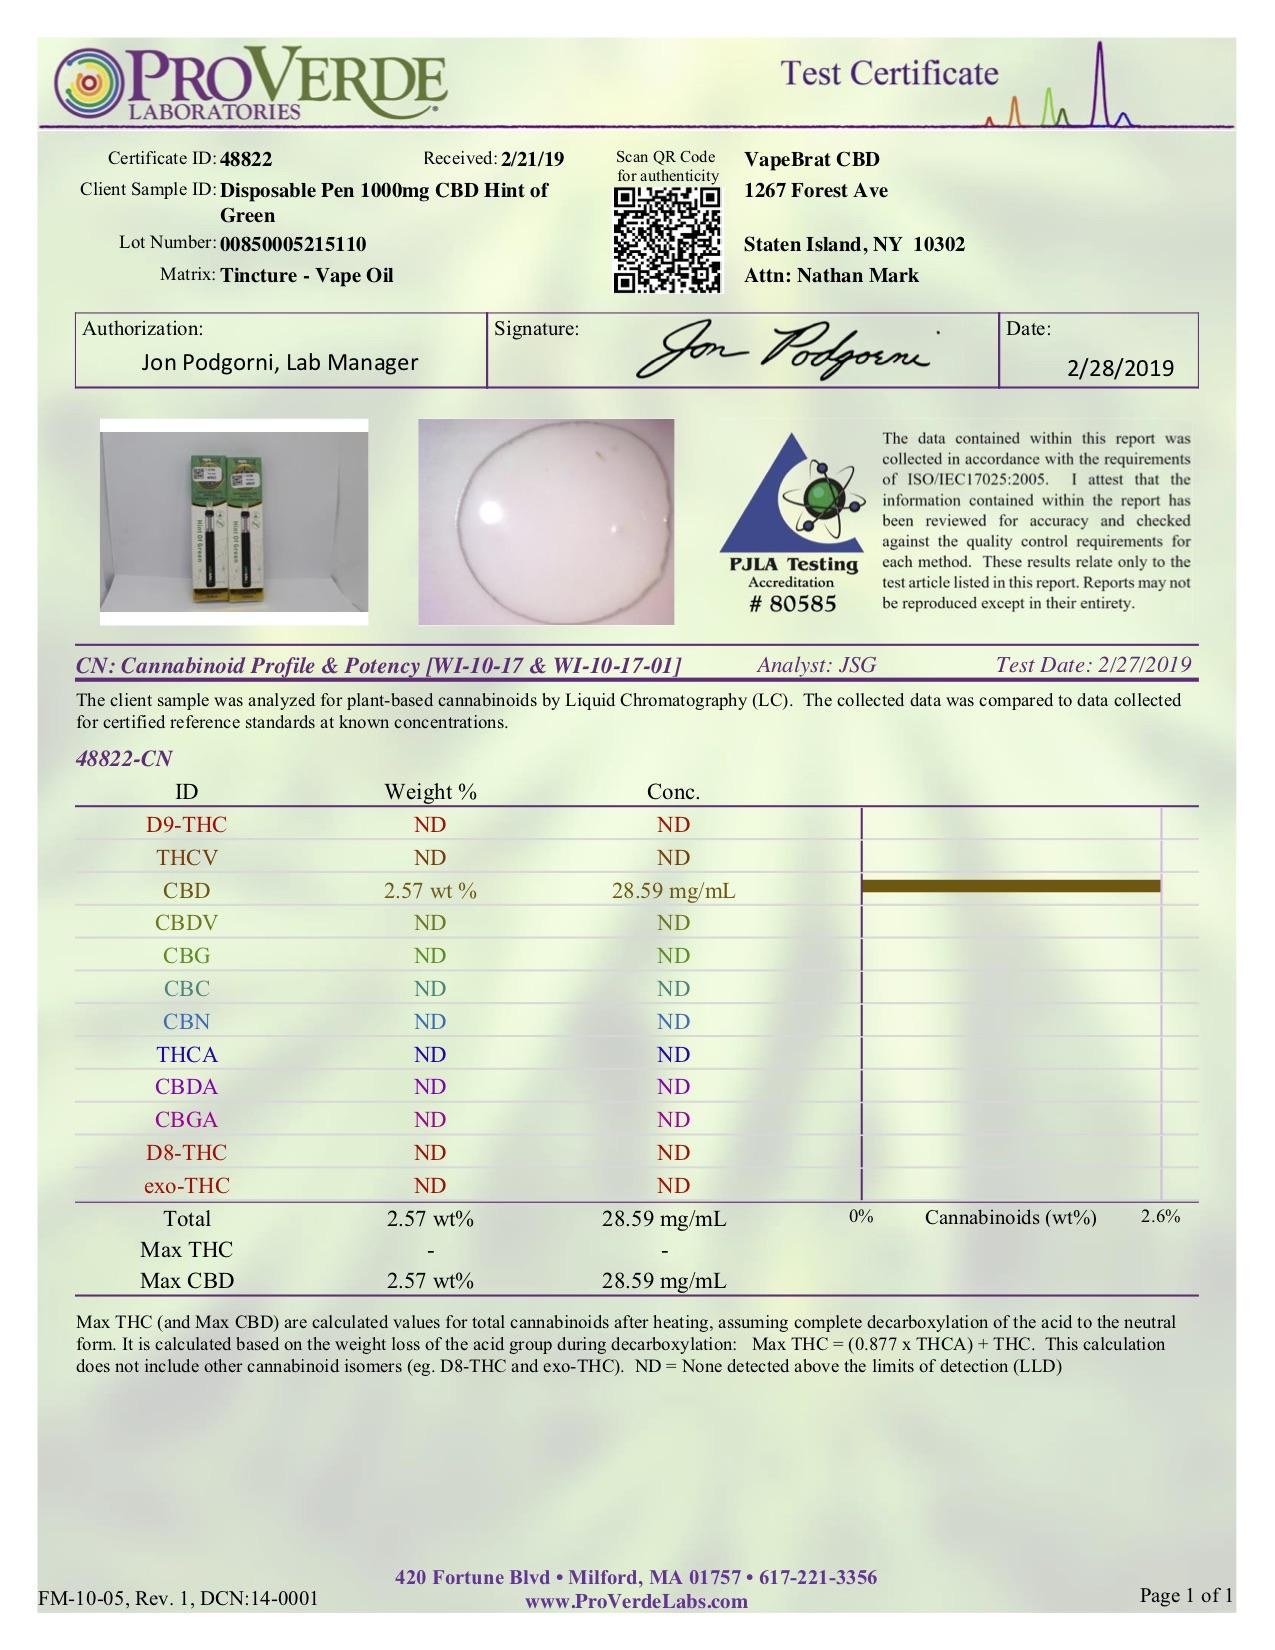 48822-cn-disposable-pen-1000mg-cbd-hint-of-green.jpg